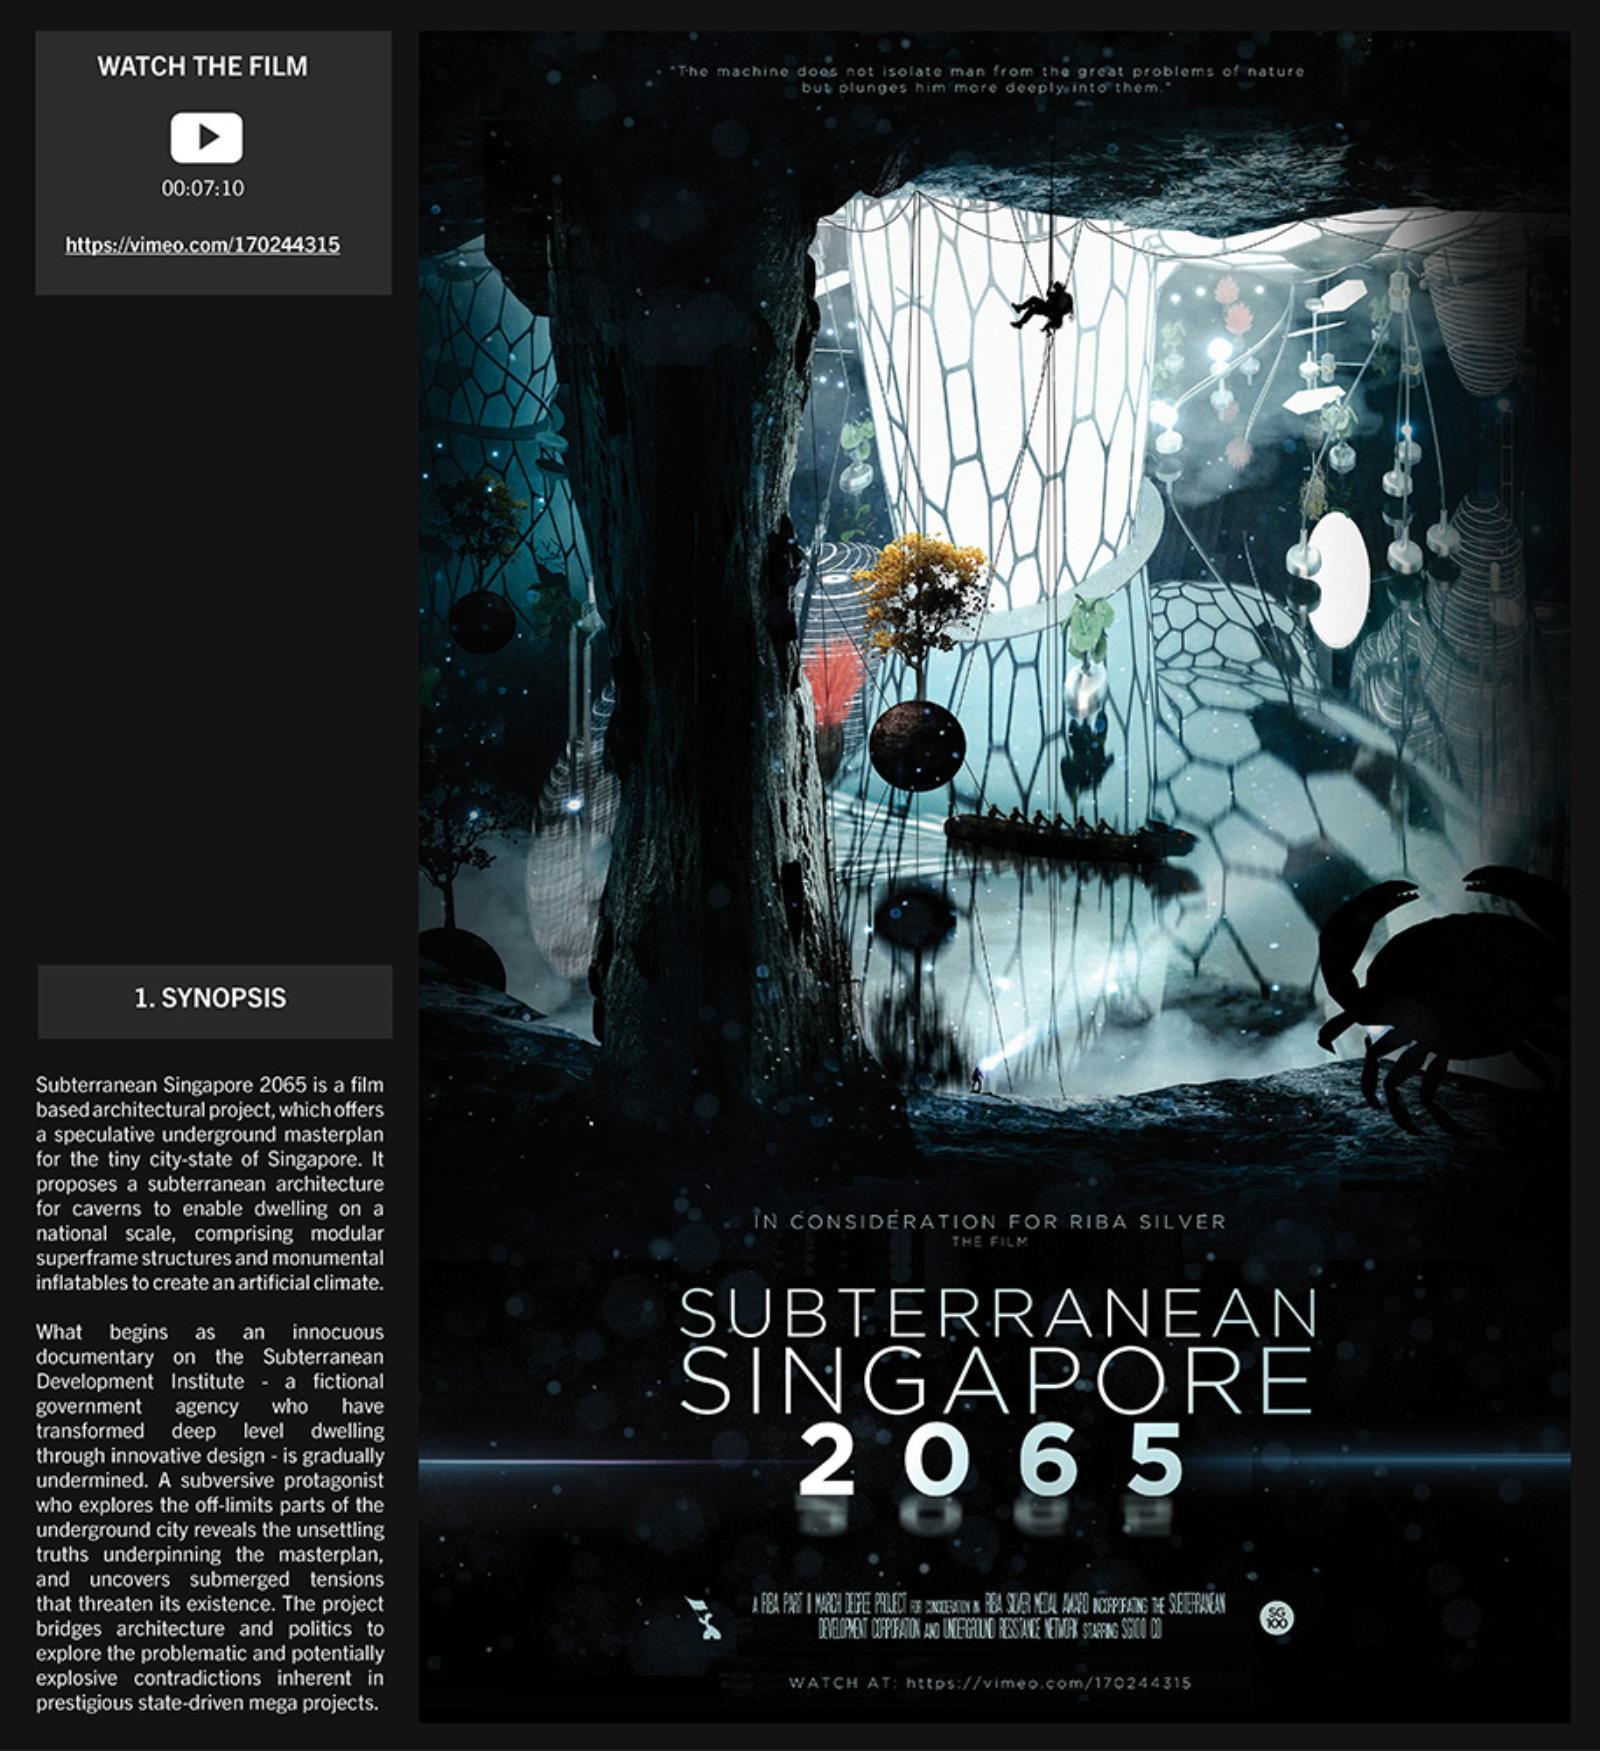 Subterranean Singapore 2065